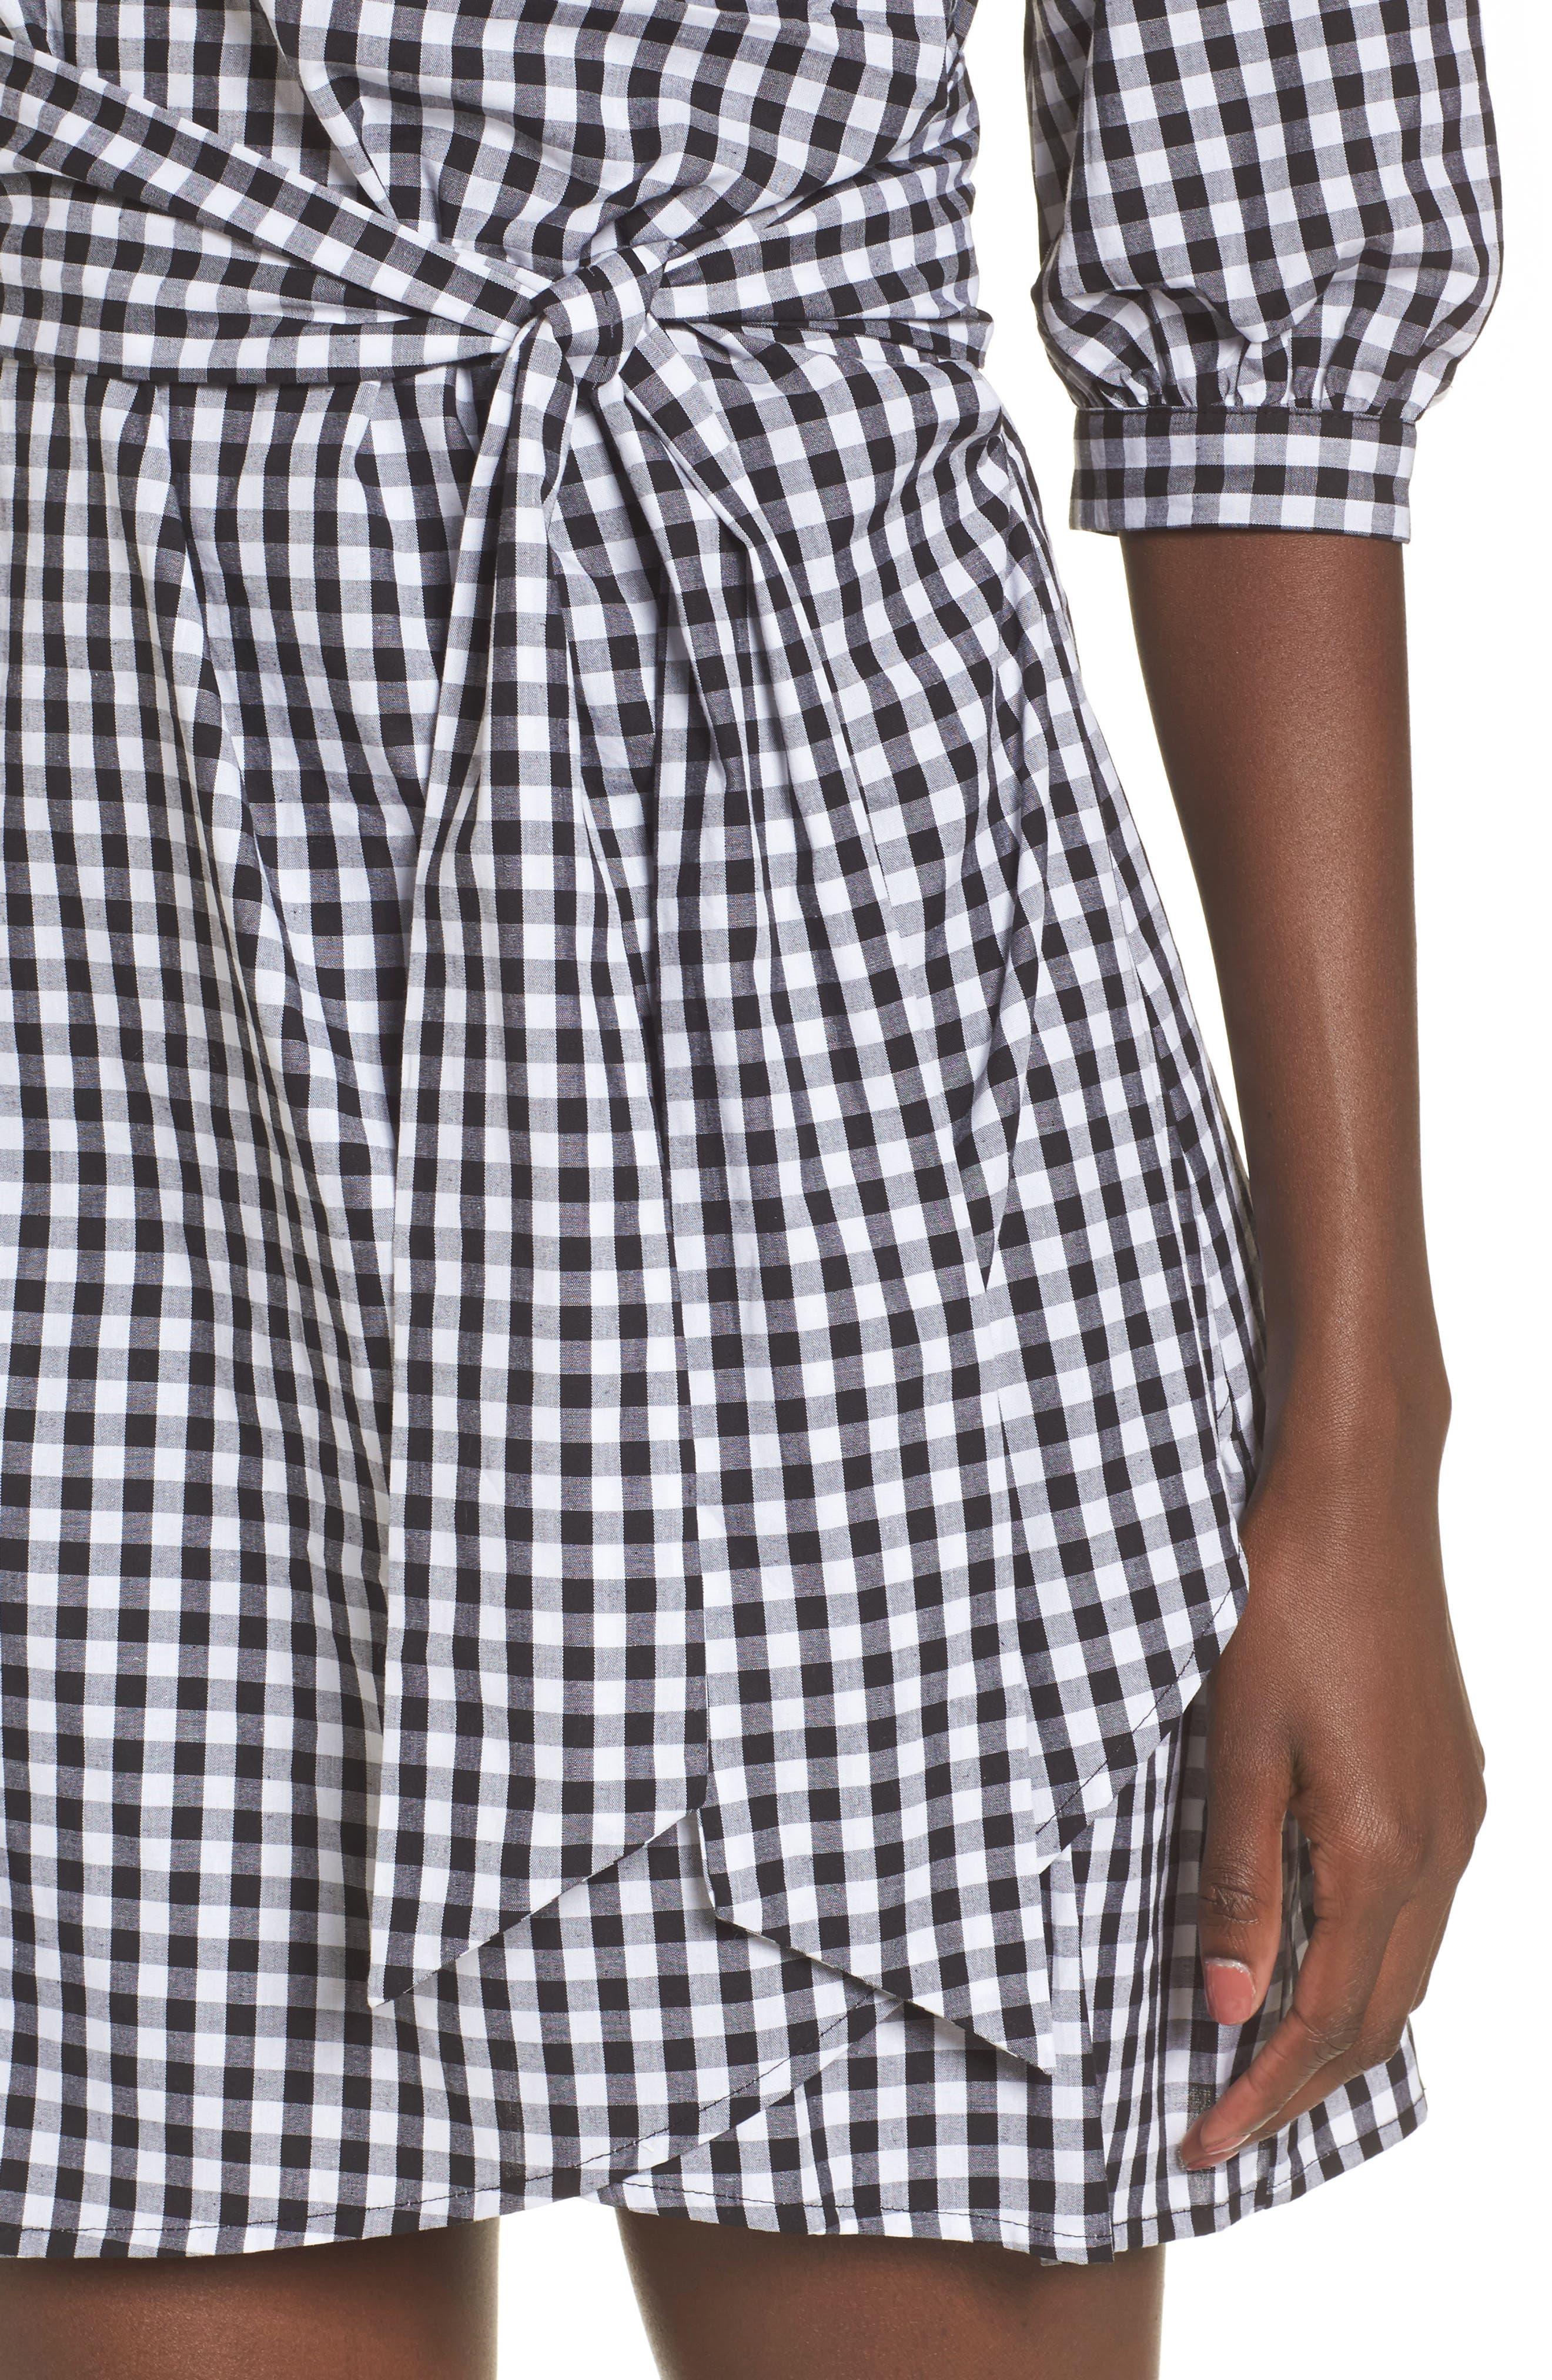 Cotton Poplin Wrap Dress,                             Alternate thumbnail 4, color,                             001